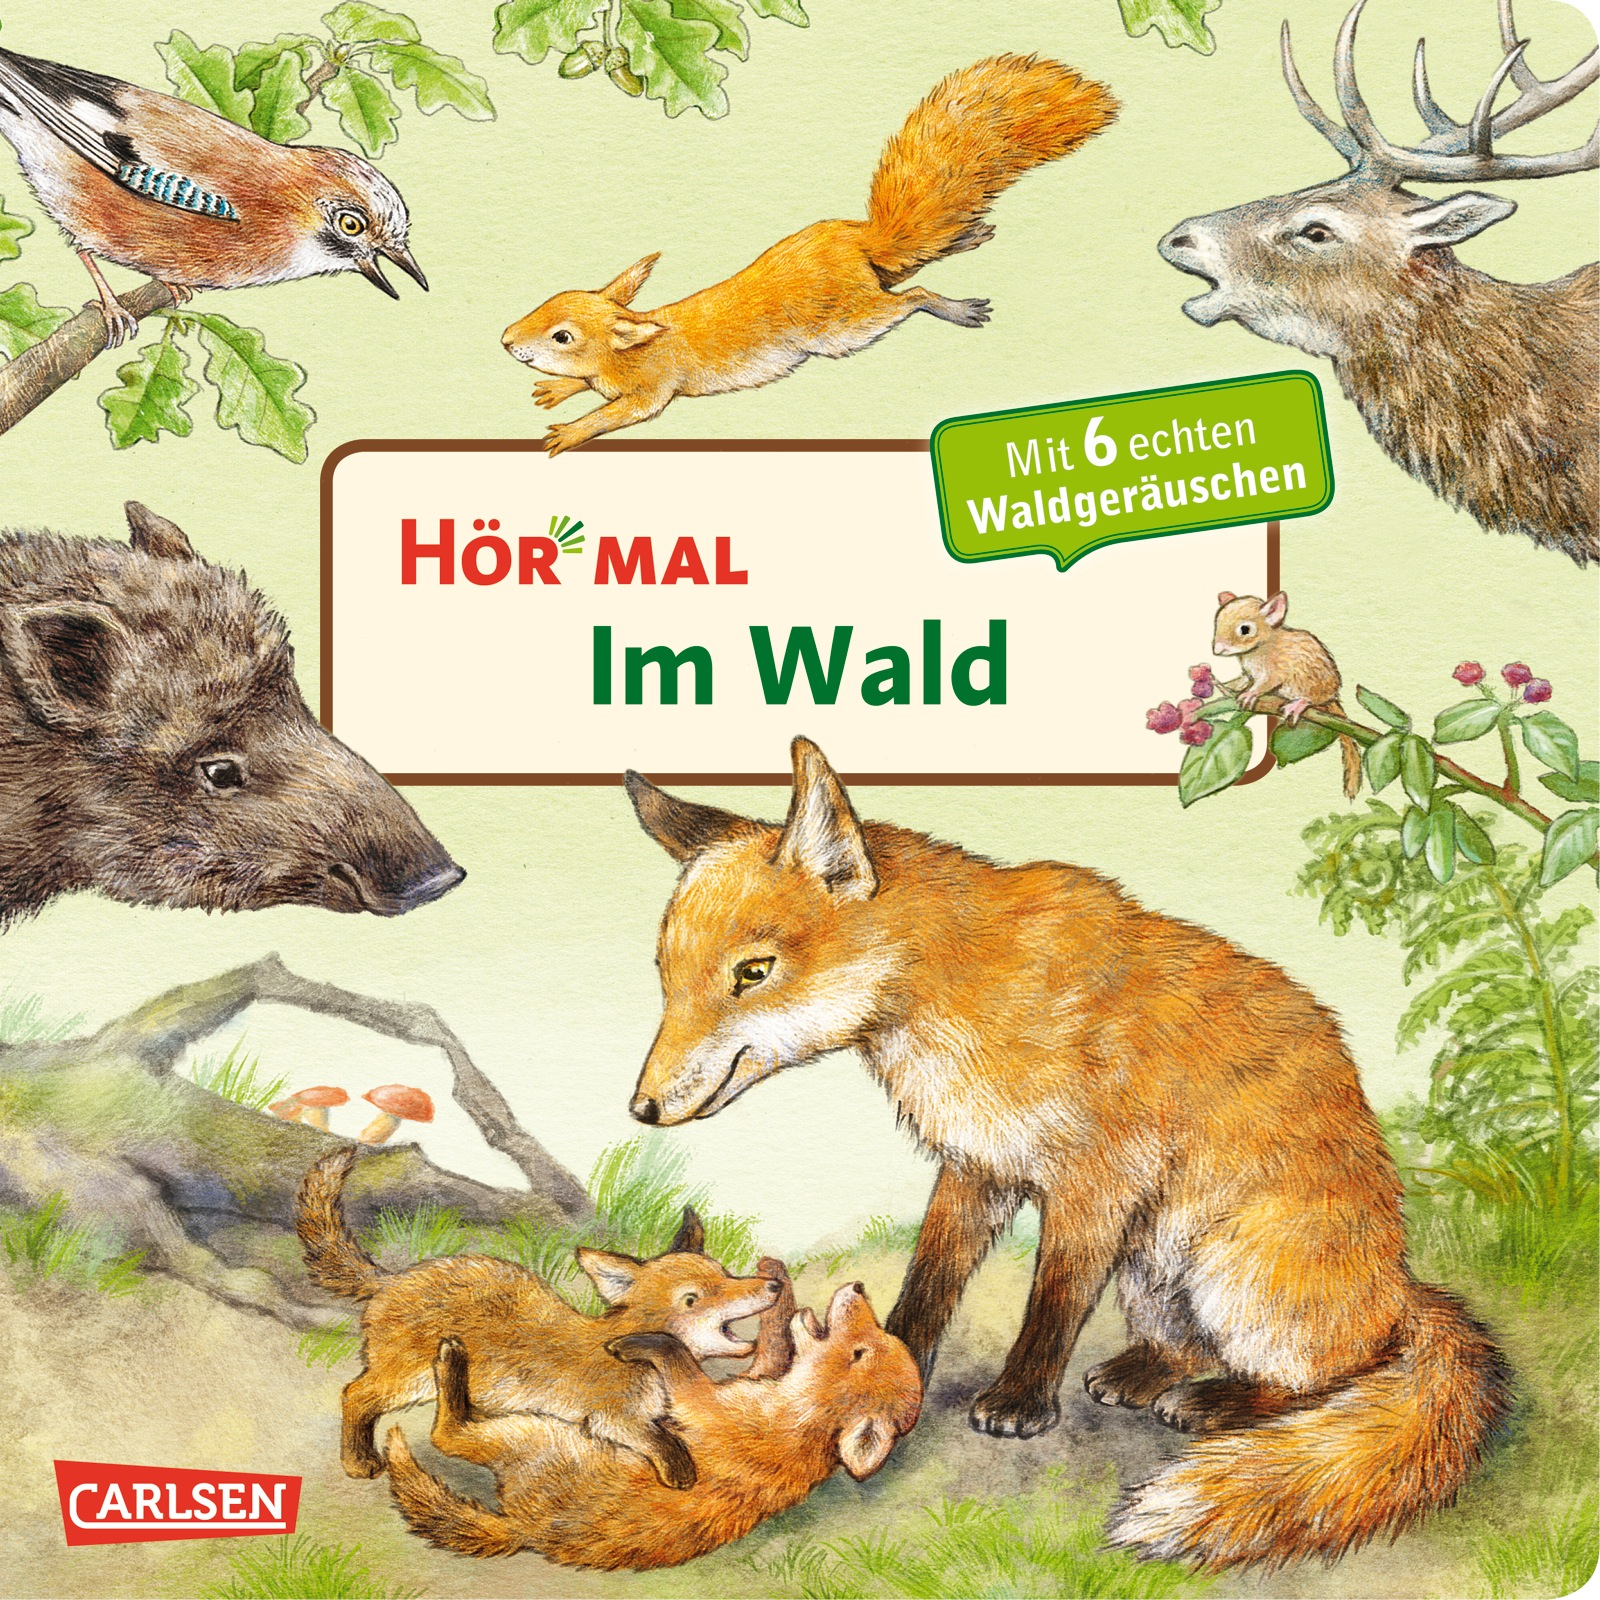 »HÖR MAL: IM WALD« — CARLSEN